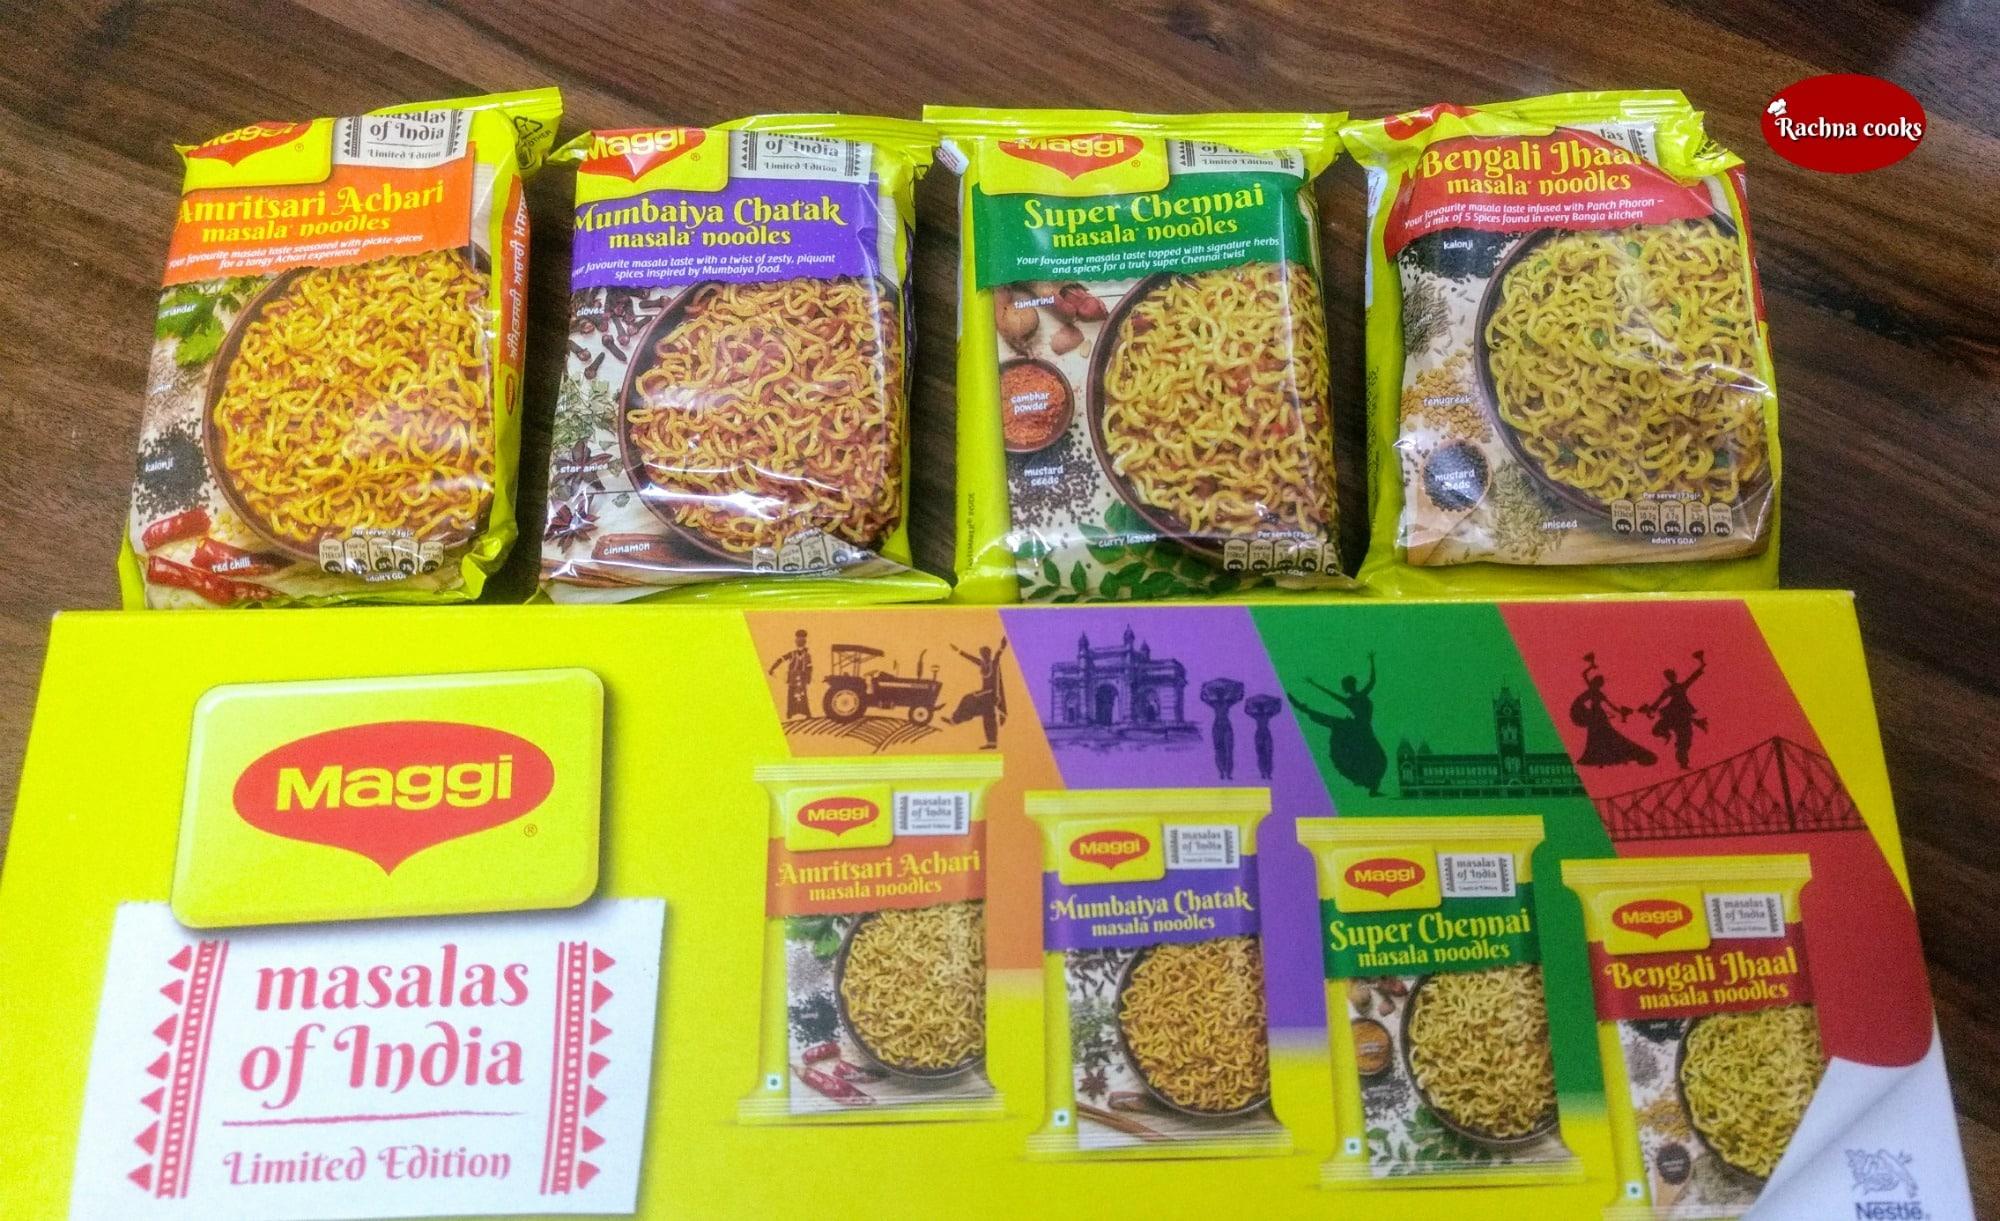 Nestlé India launches 4 new Maggi flavours #MasalasofIndia